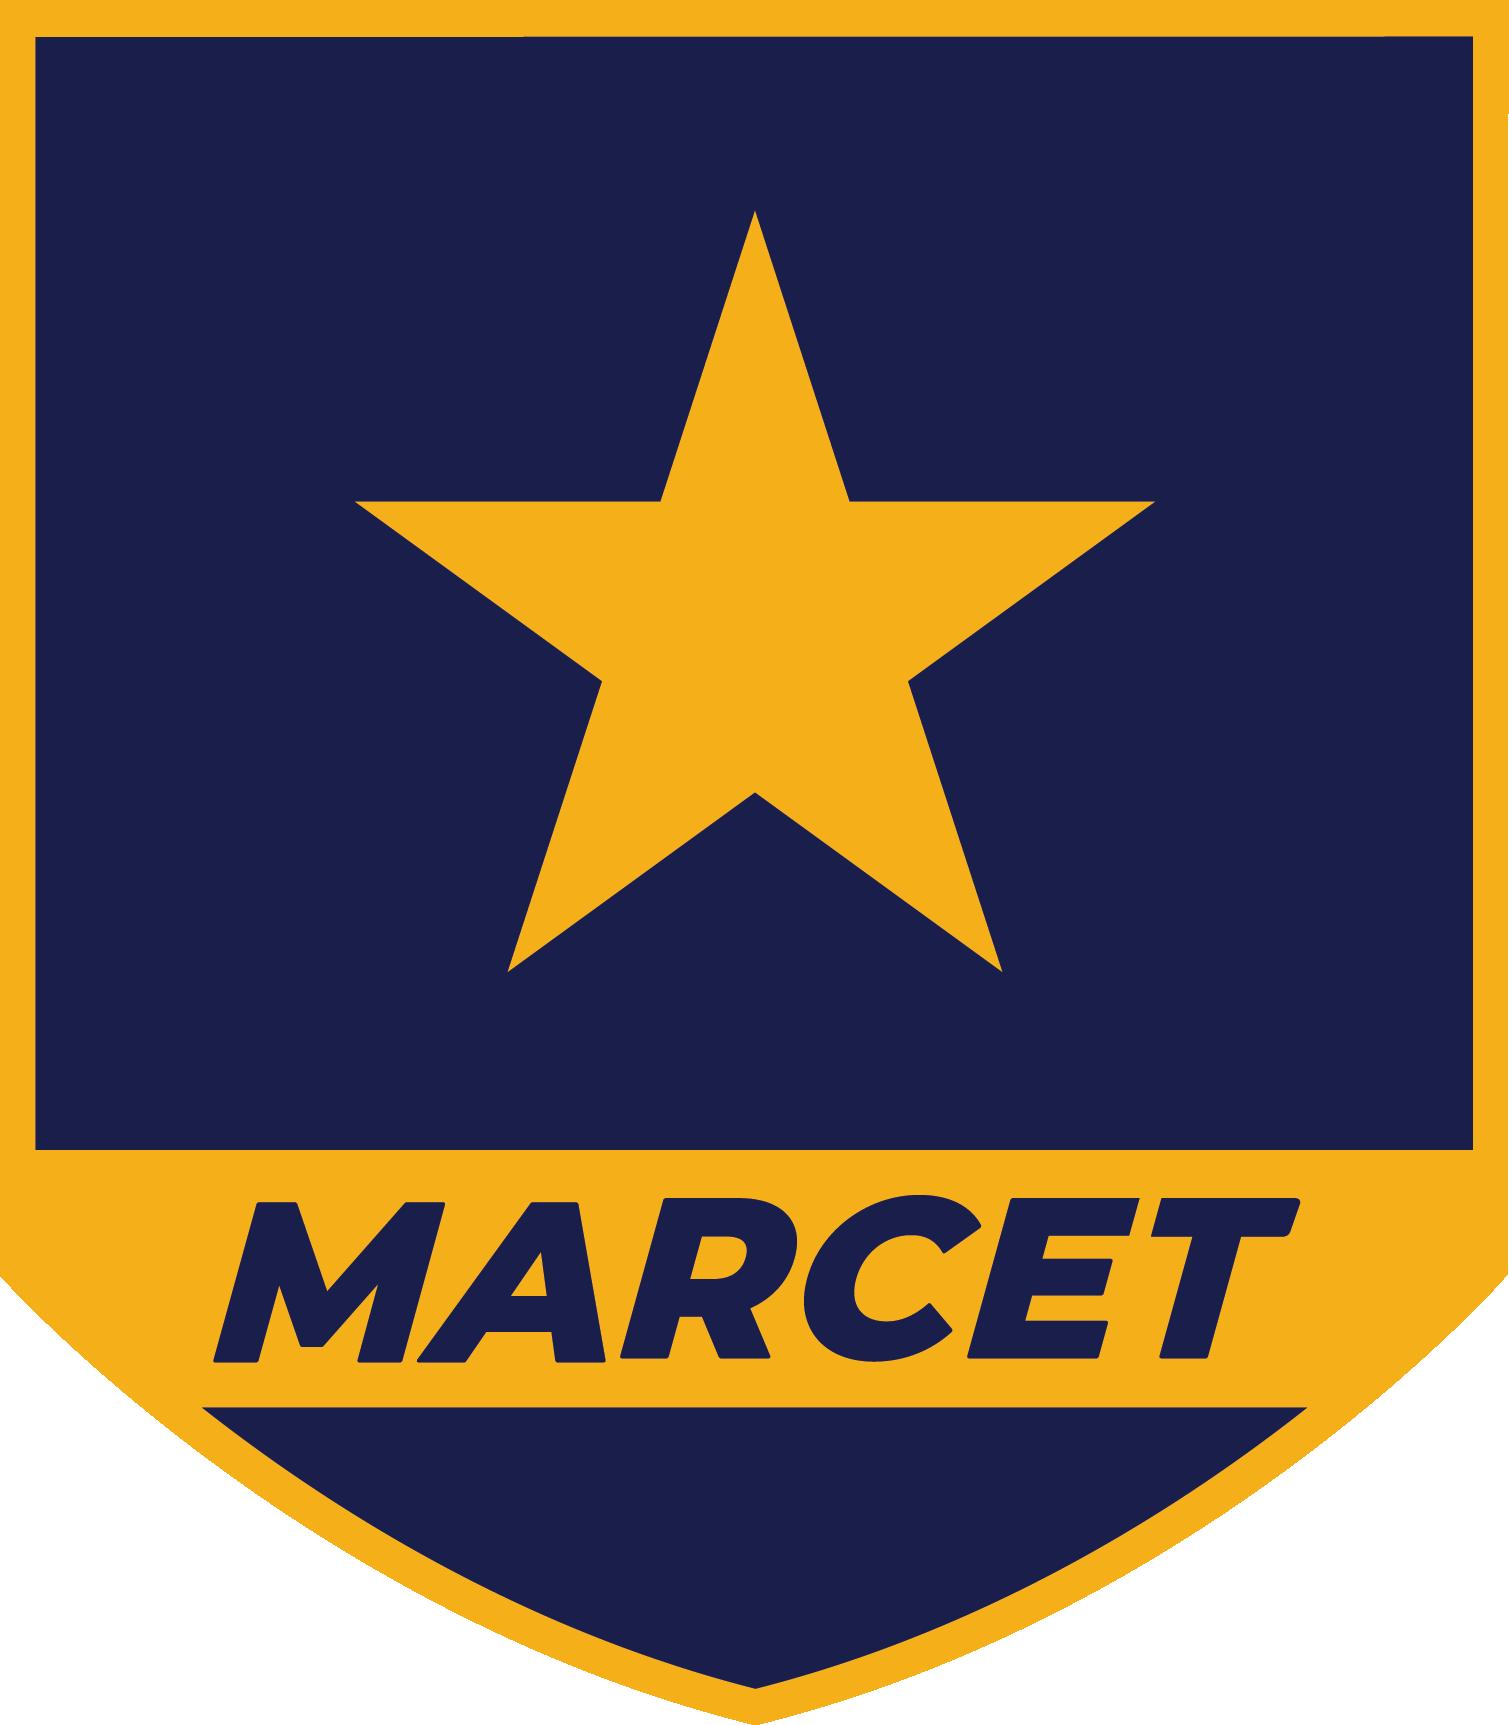 logotipo MARCET 2018